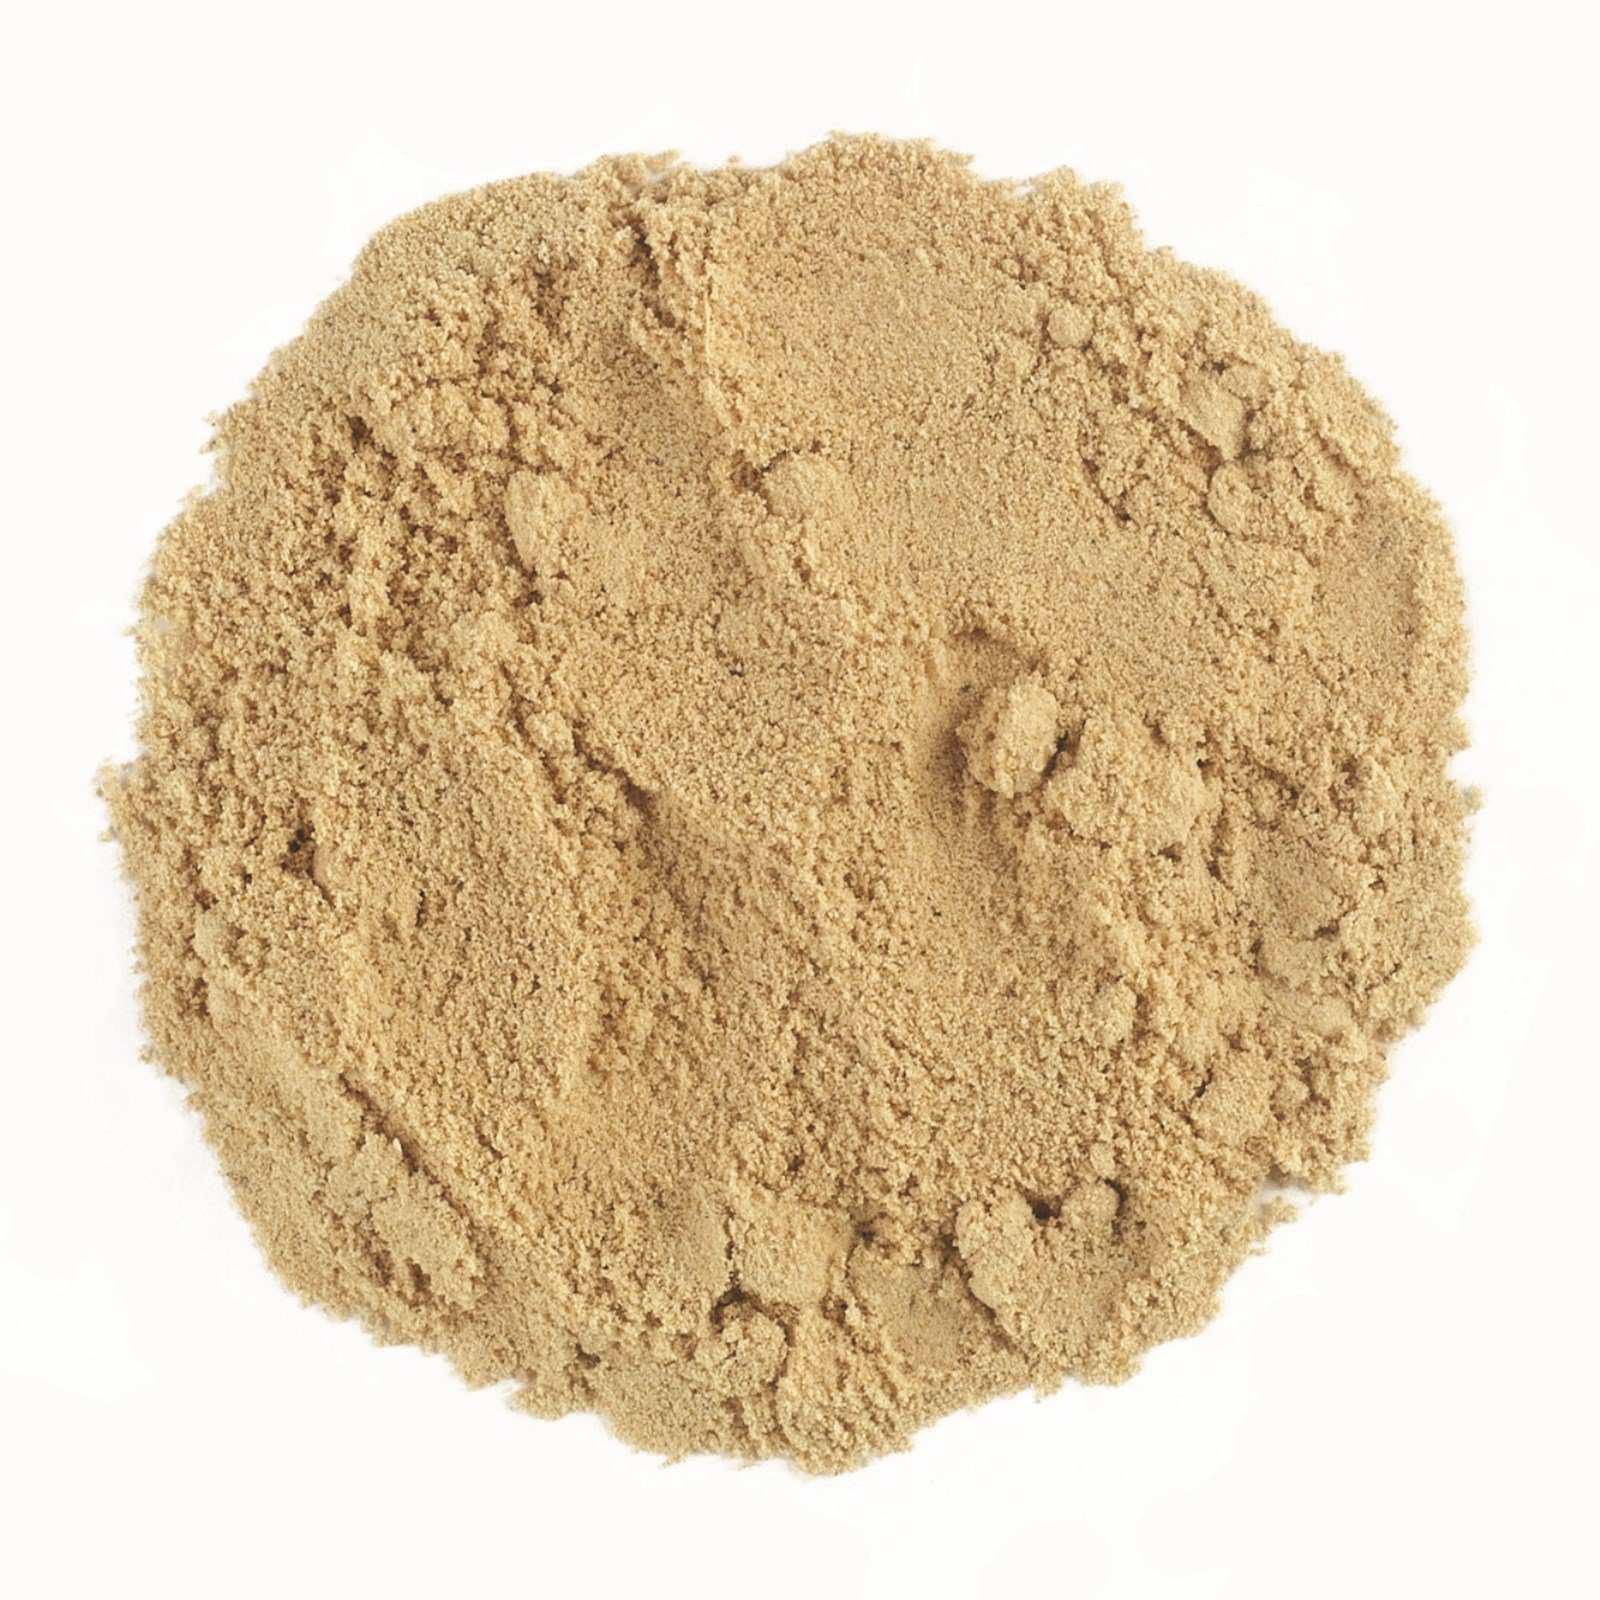 Frontier Natural Products, Молотый несульфитированный корень имбиря, 16 унций (453 г)